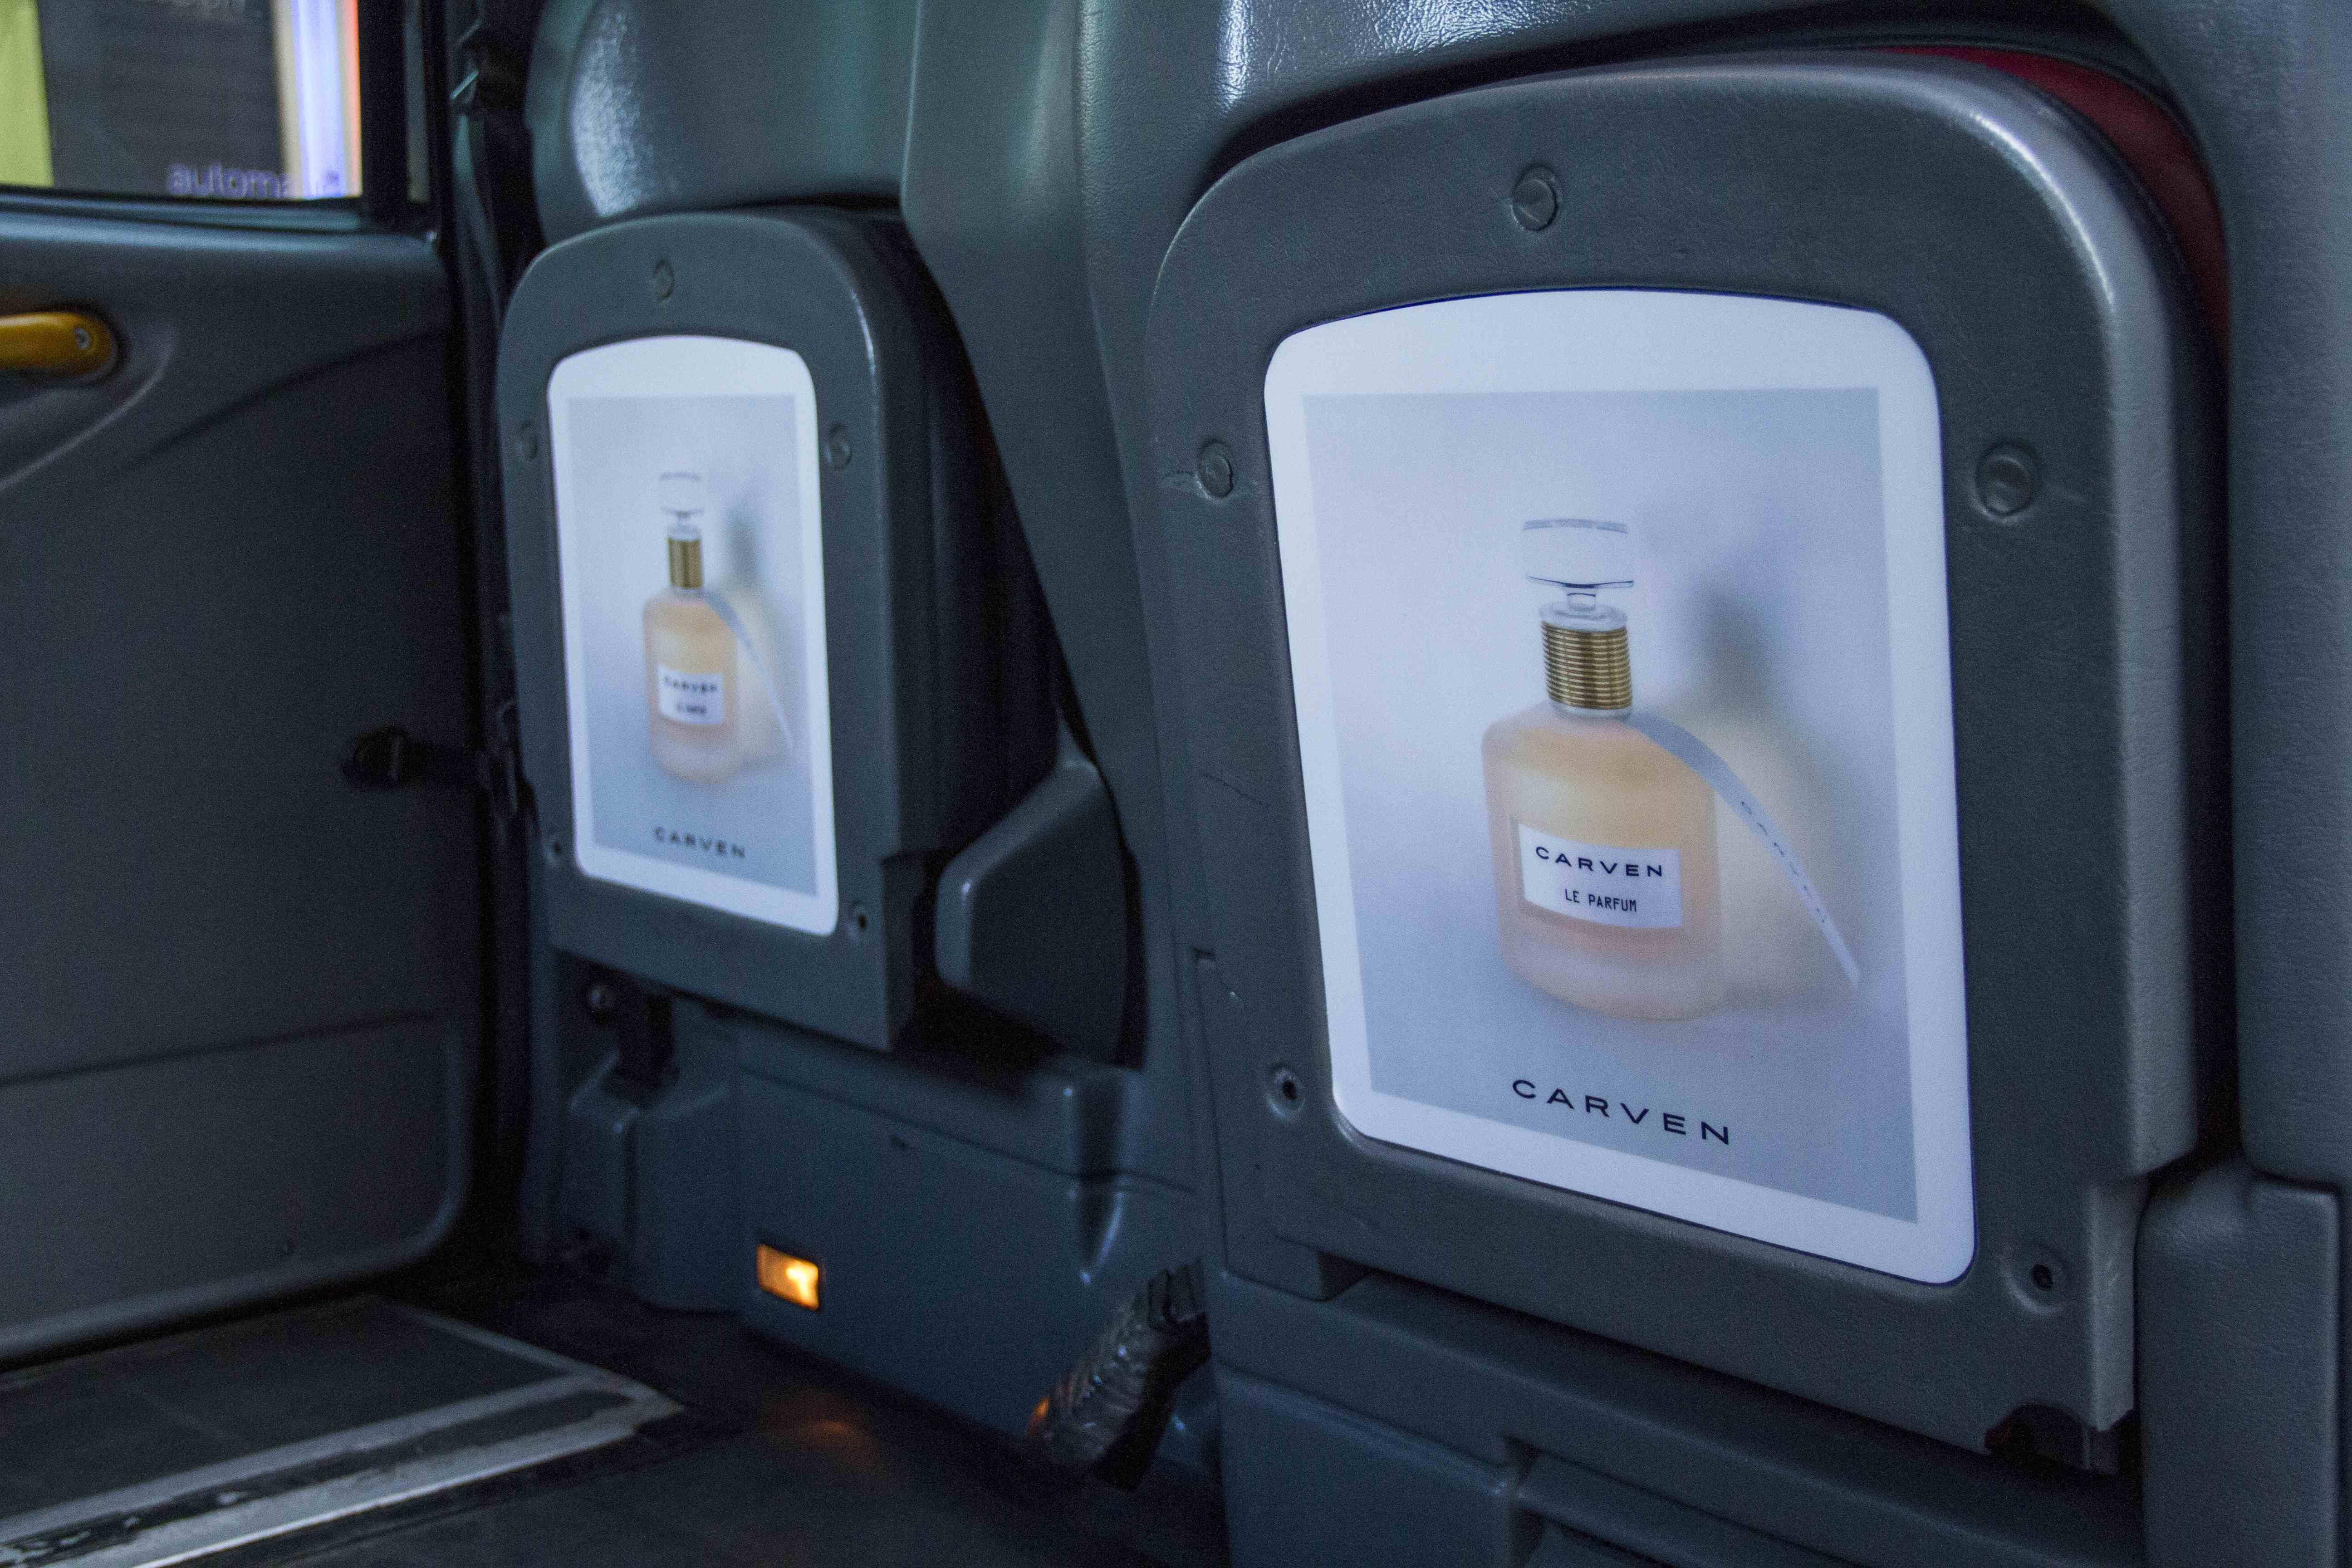 2013 Ubiquitous taxi advertising campaign for Carven - Carven Parfums